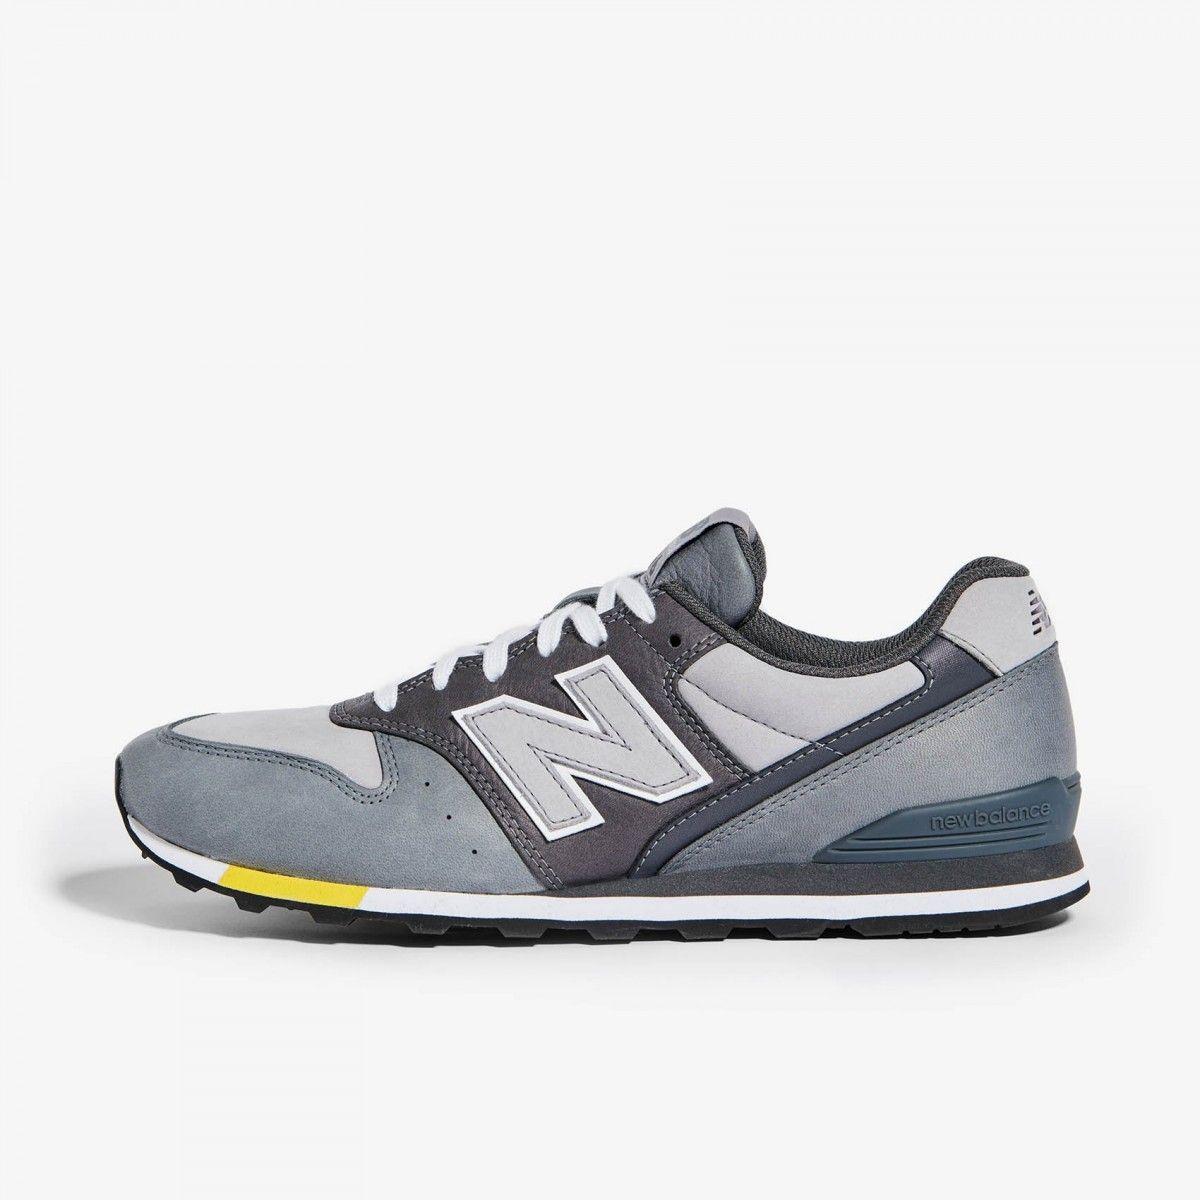 new balance clogs mules